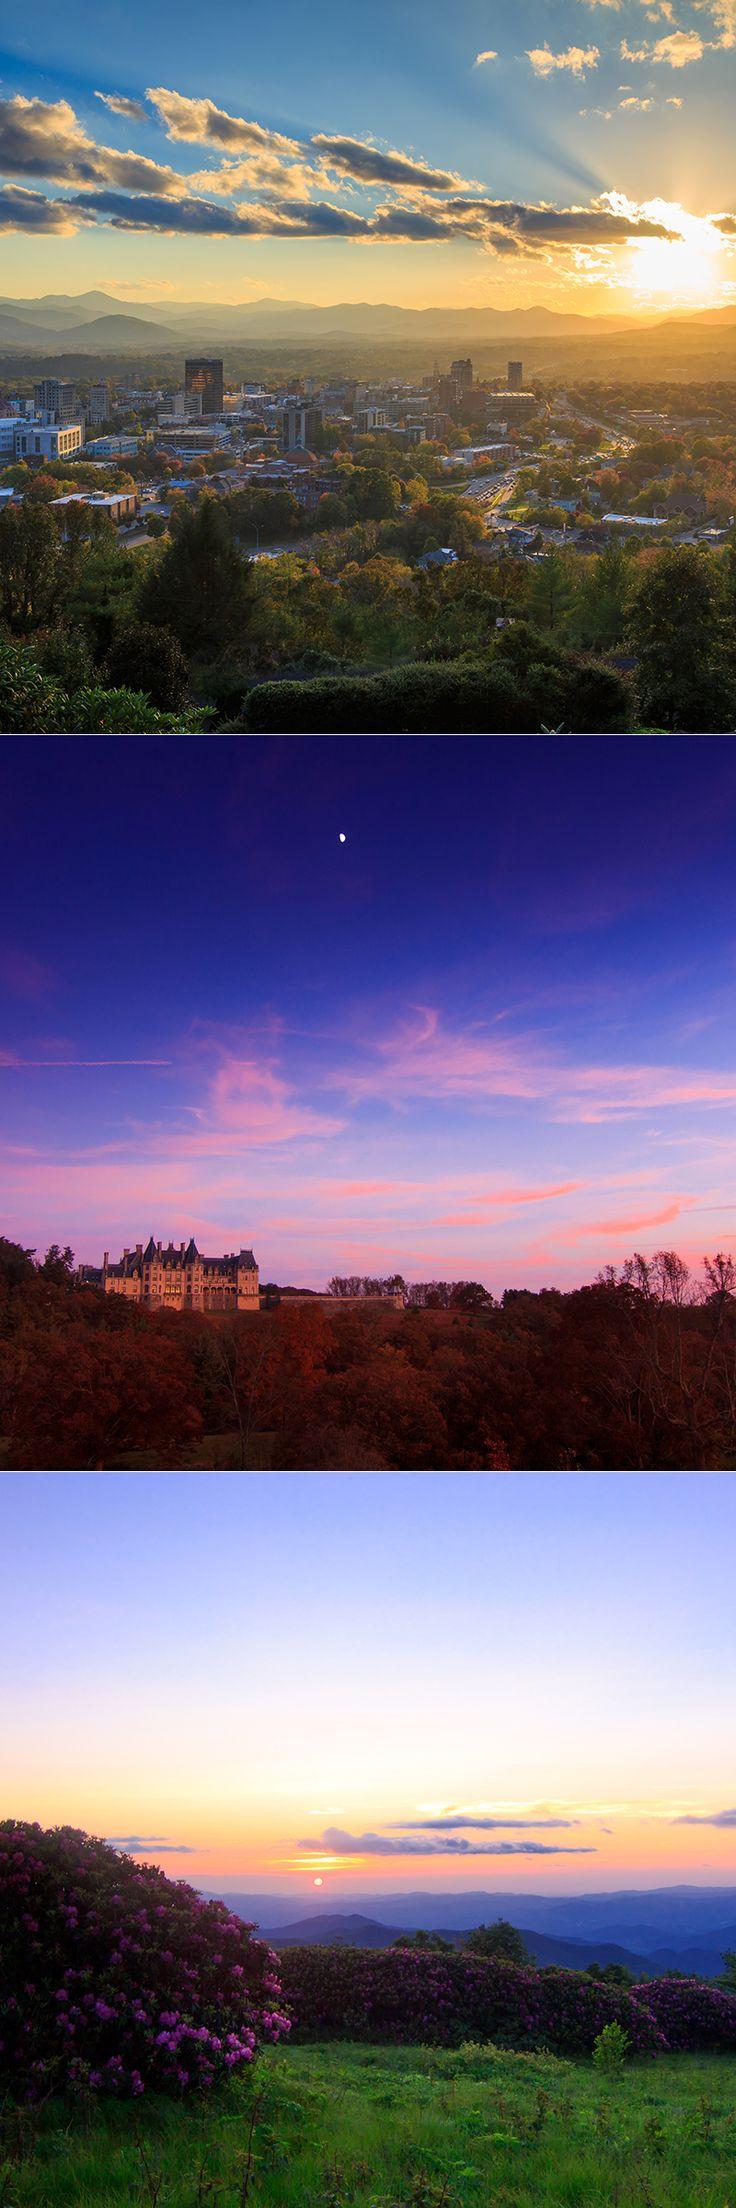 Top 5 Spots to Catch the Sunset in Asheville, N.C. #travel #sunset #blueridgemountains   ExploreAsheville.com